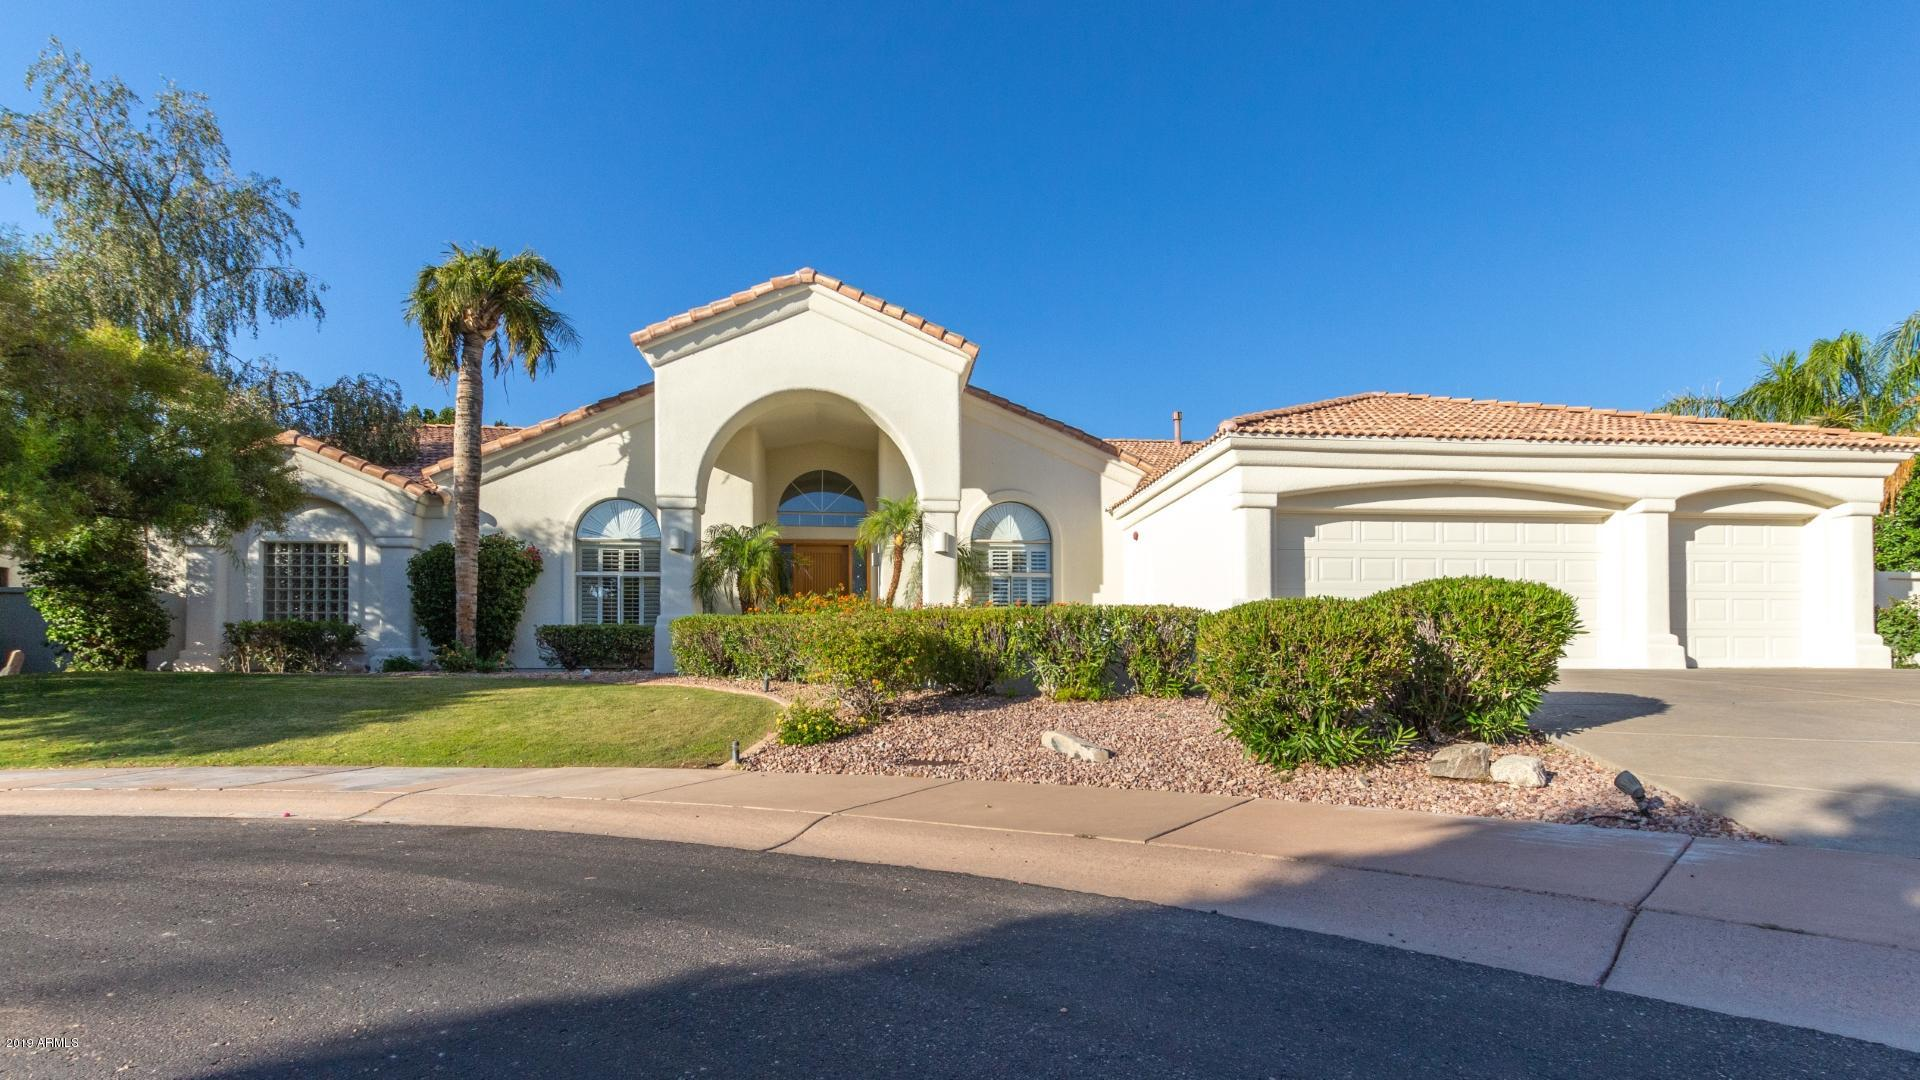 Photo of 11438 E Palomino Road, Scottsdale, AZ 85259